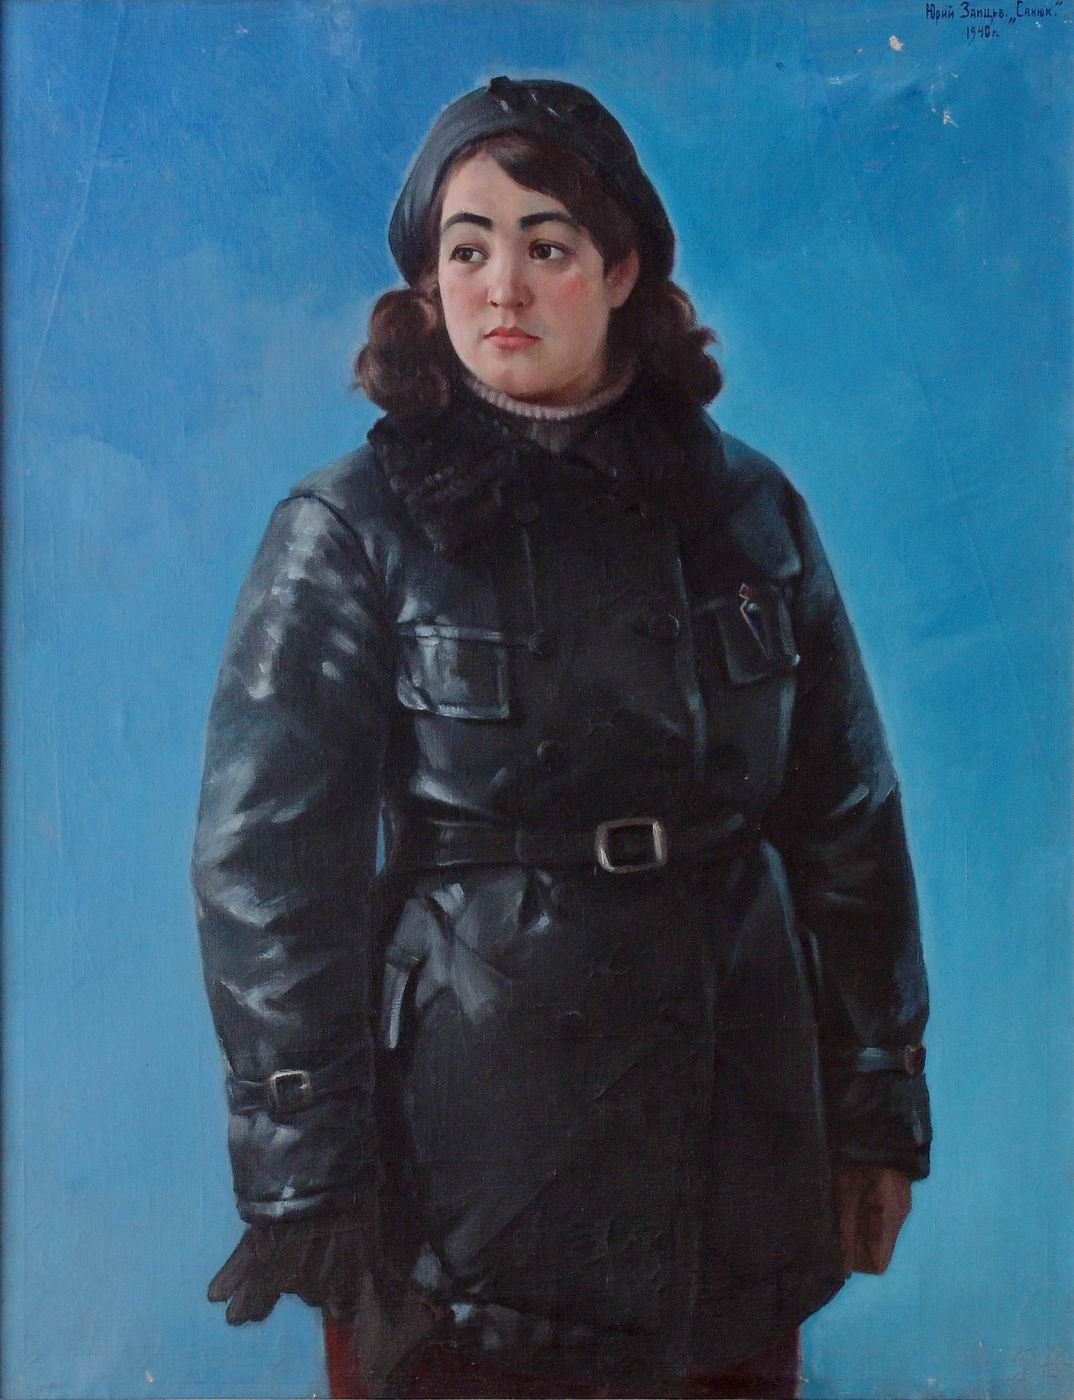 Зайцев Ю.А. Женщина в кожанке. (Санюк). 1940